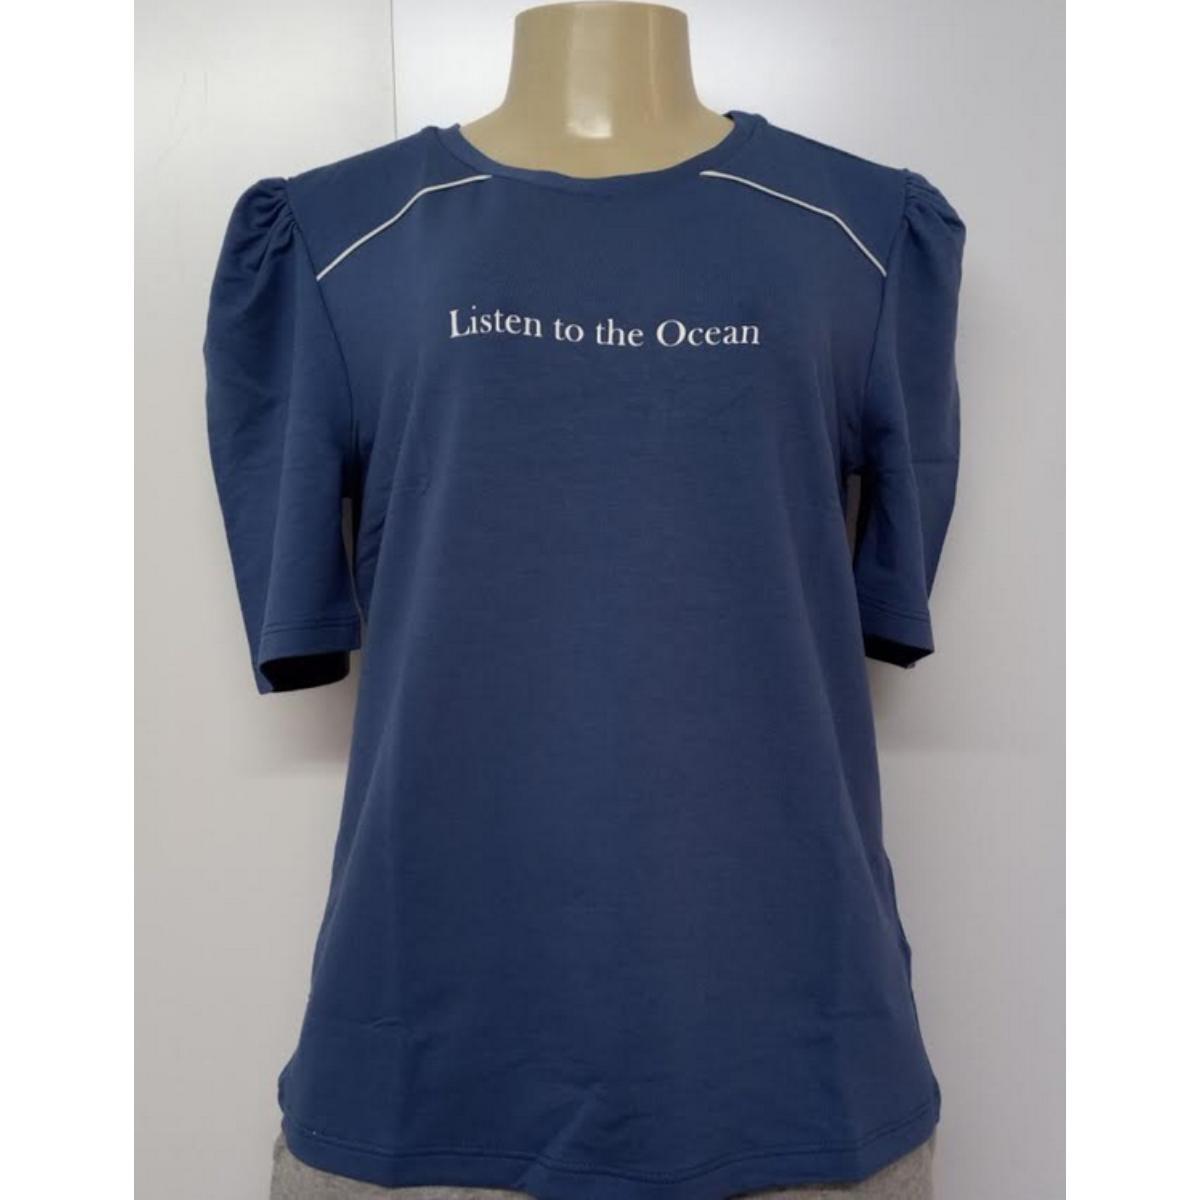 Blusa Feminina Lado Avesso L114469 Azul Jeans